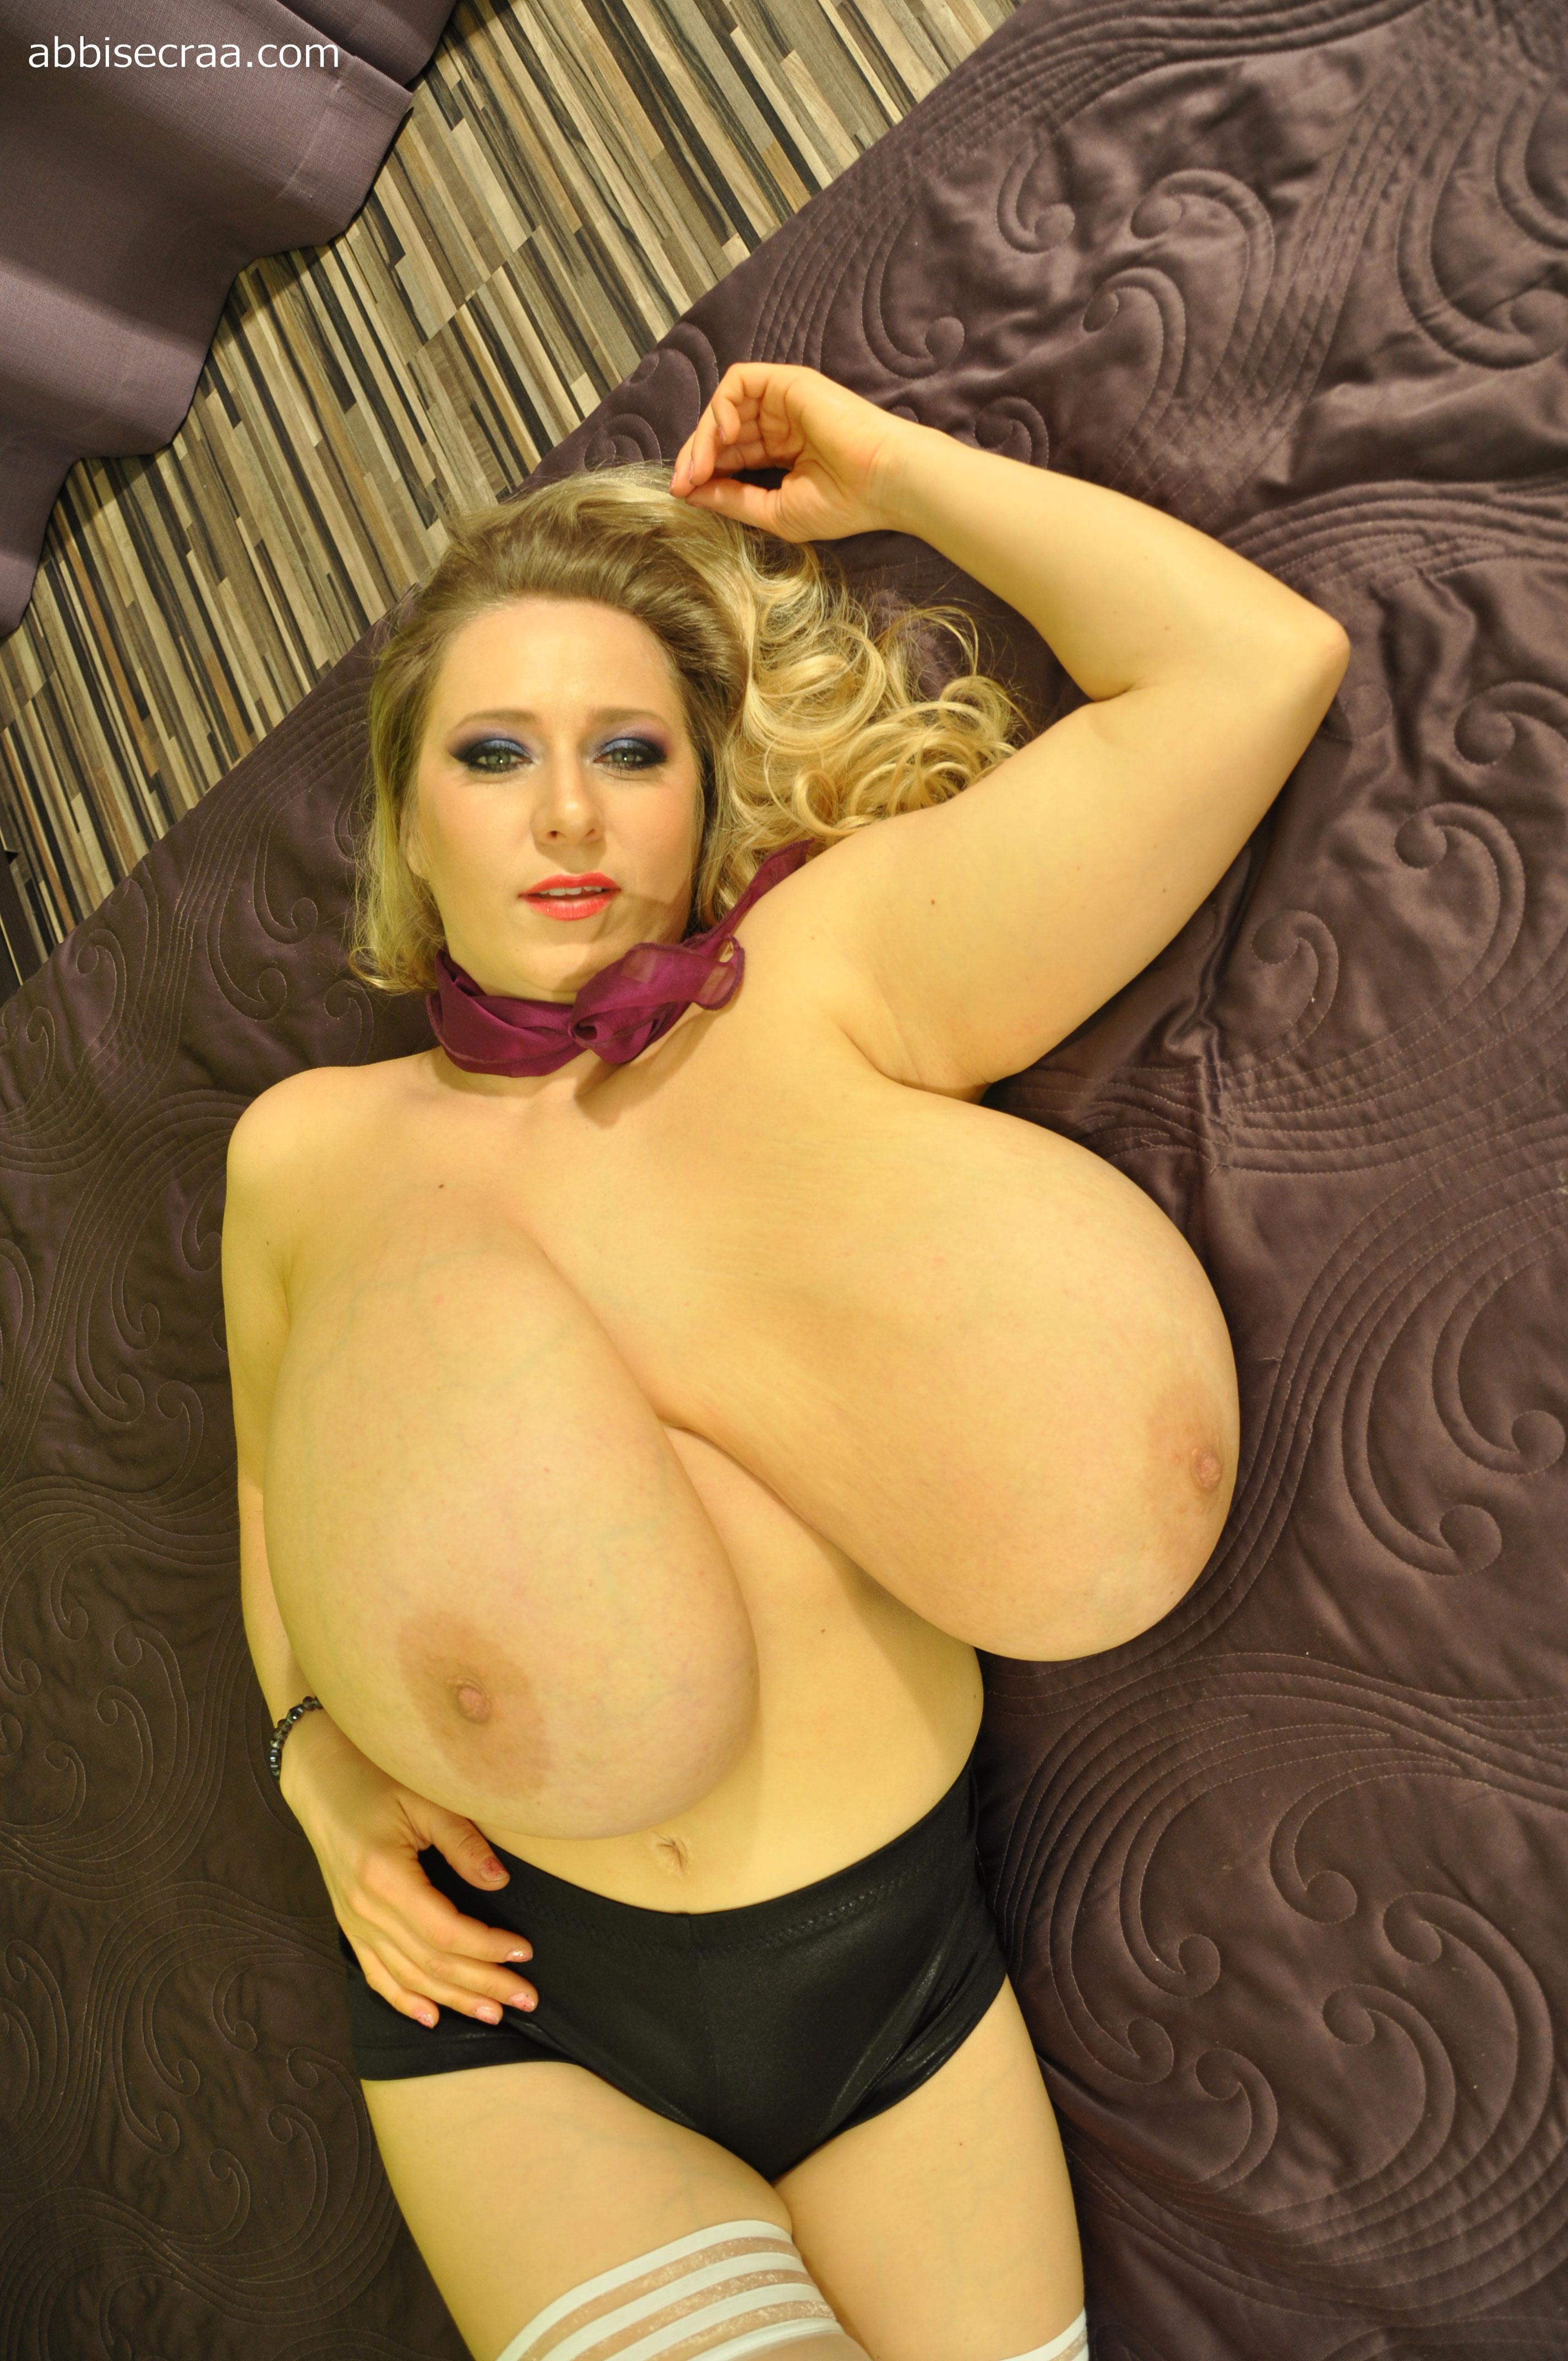 Rachel smith naked sex